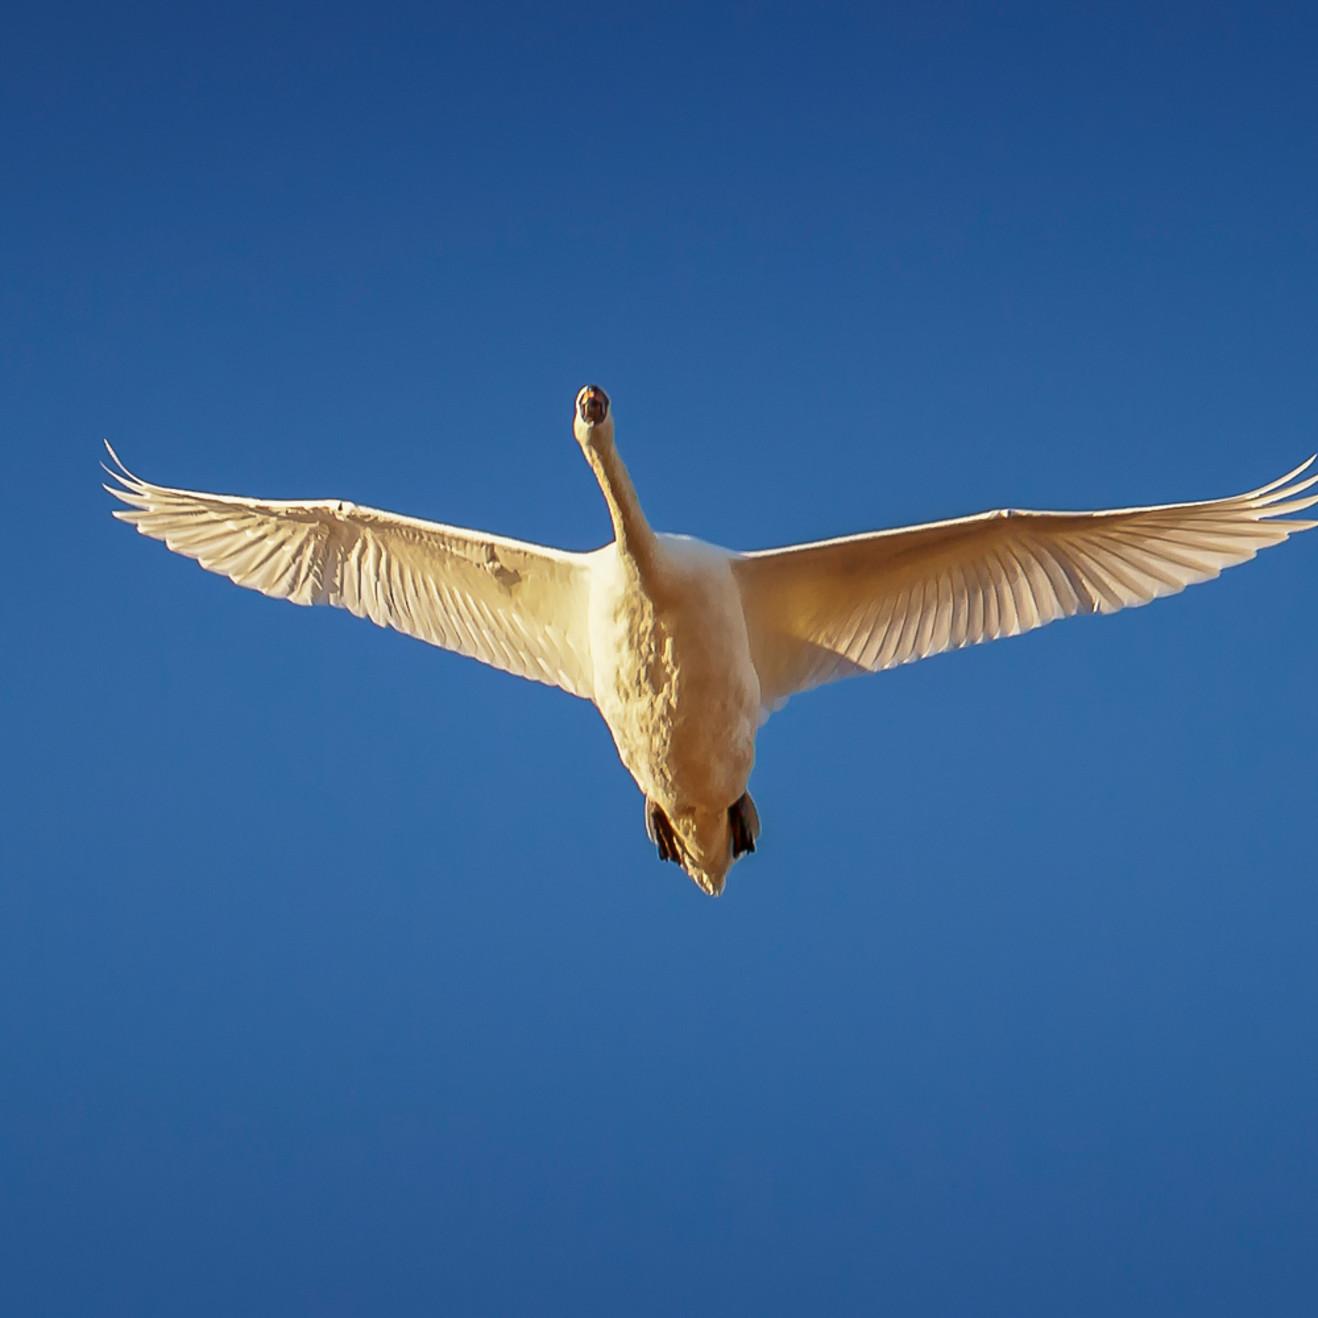 Long point blue sky swan emyj9c